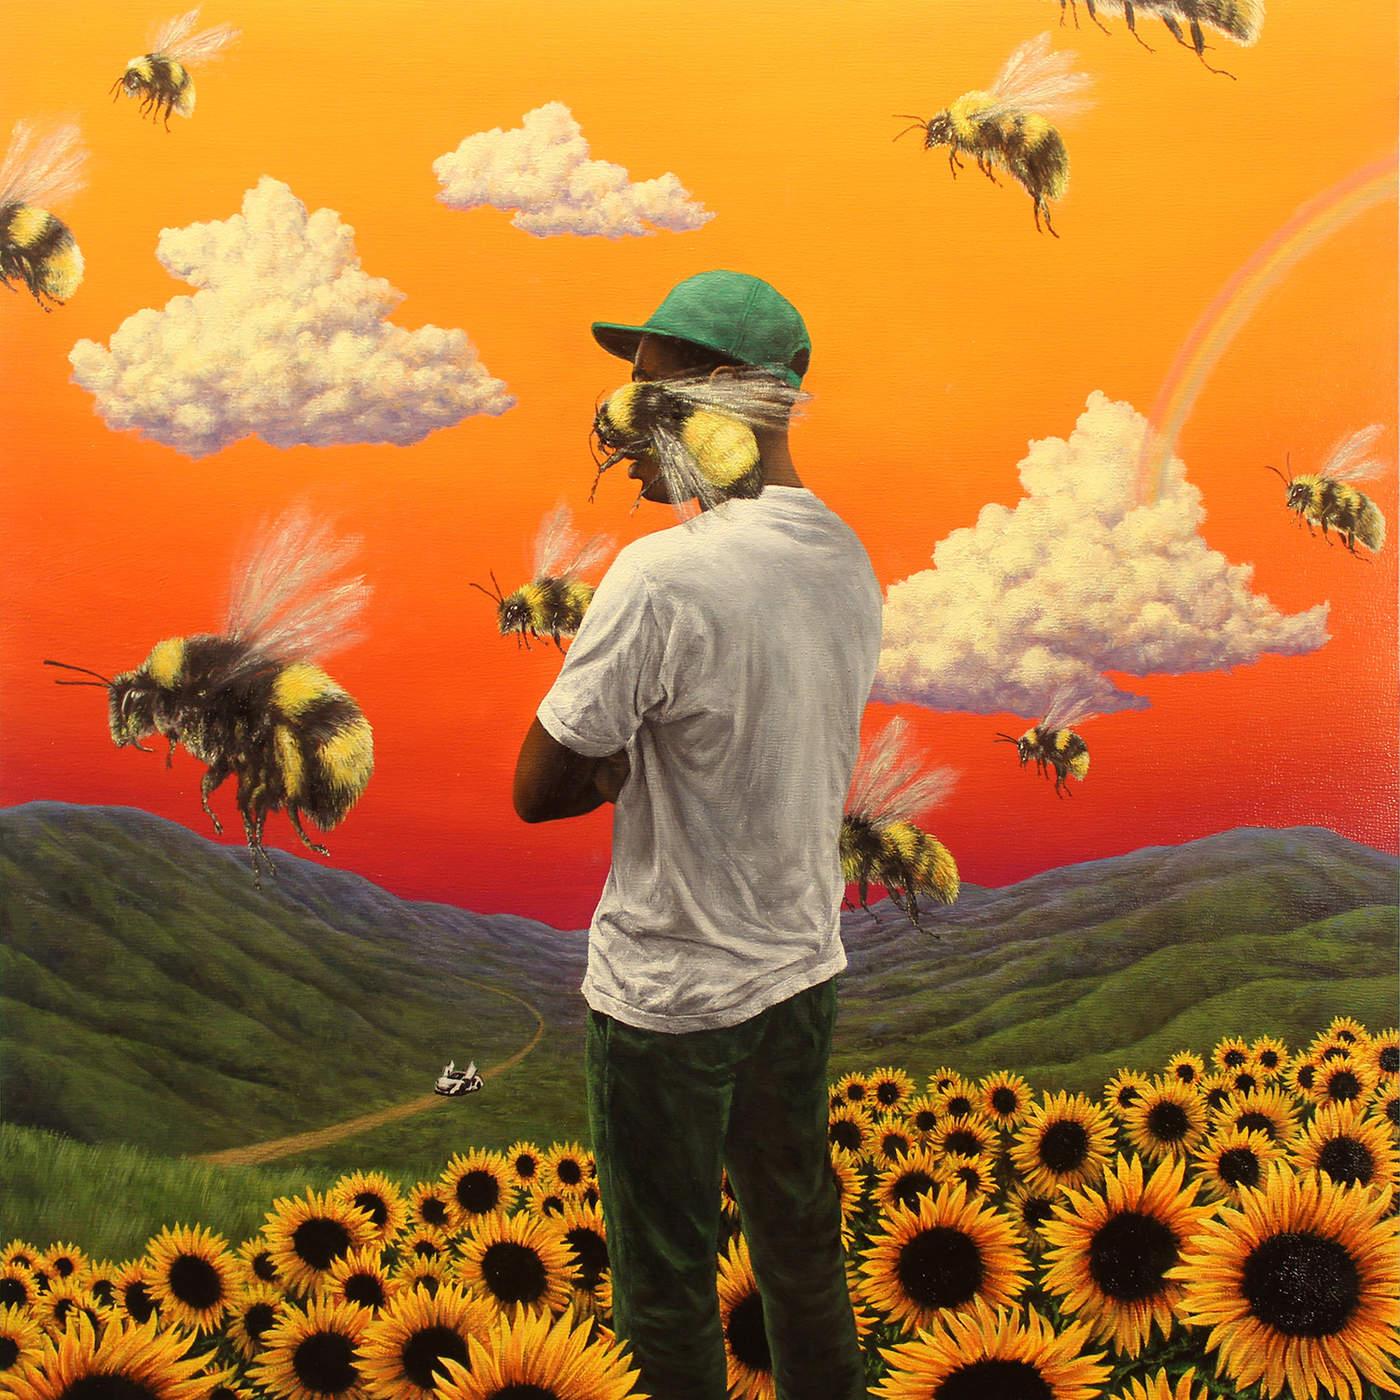 Scum Fuck Flower Boy's album art